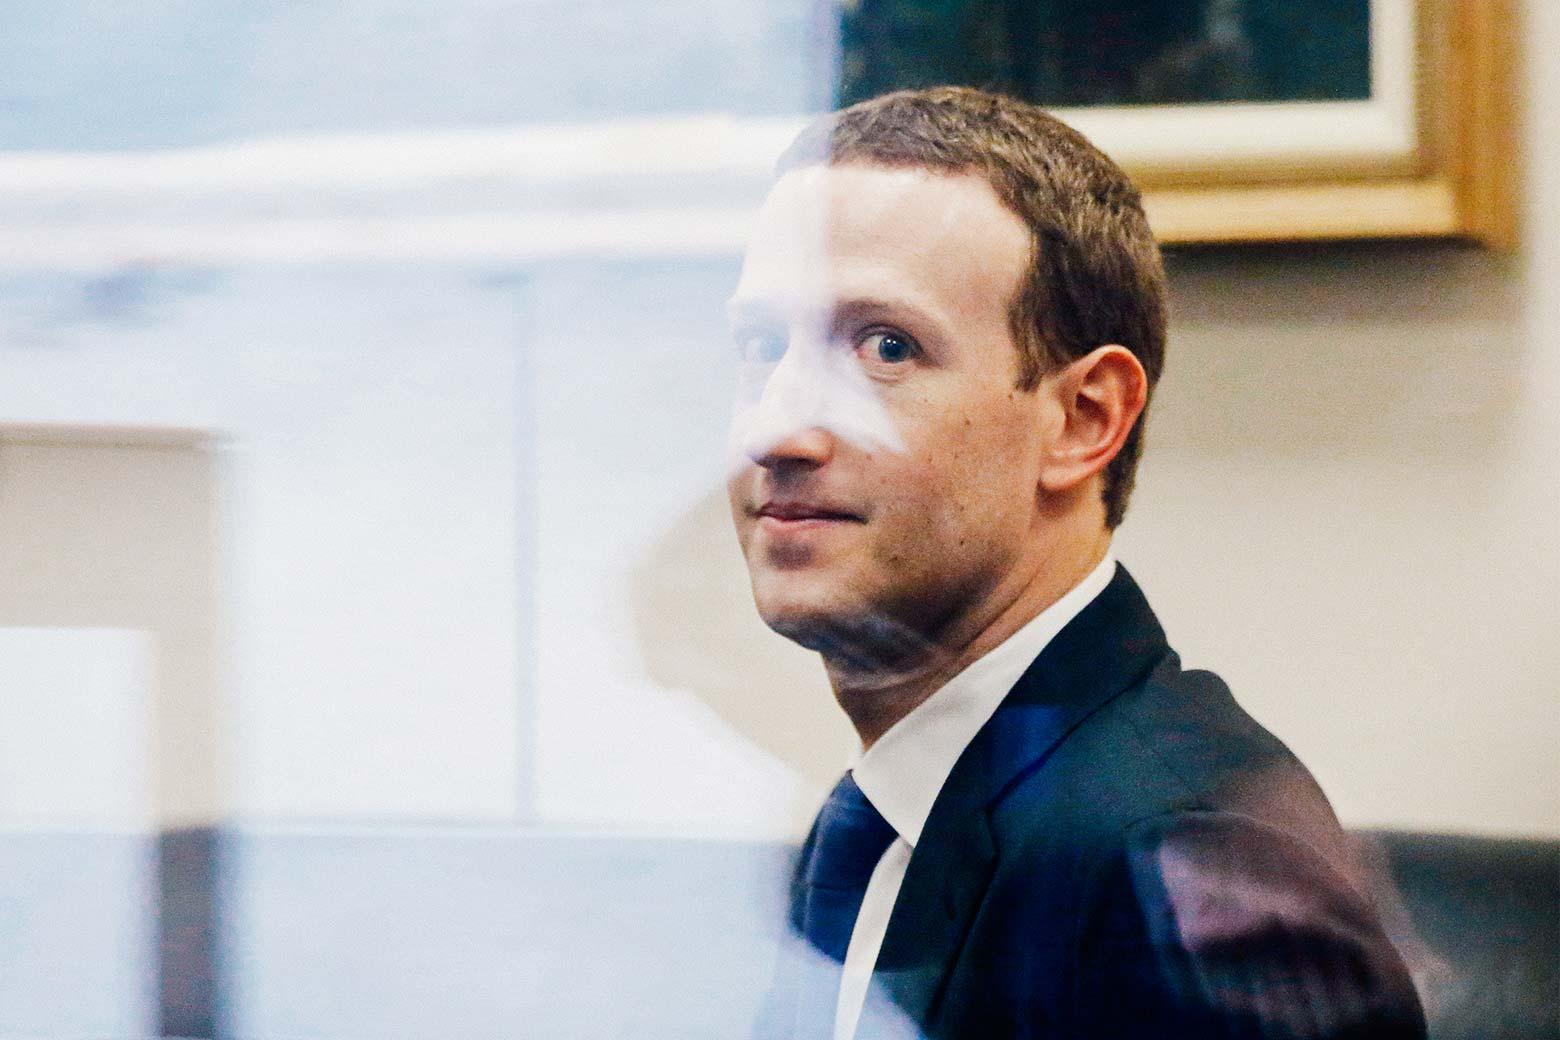 Facebook CEO Mark Zuckerberg sits in the office of Florida Sen. Bill Nelson on Monday in Washington.